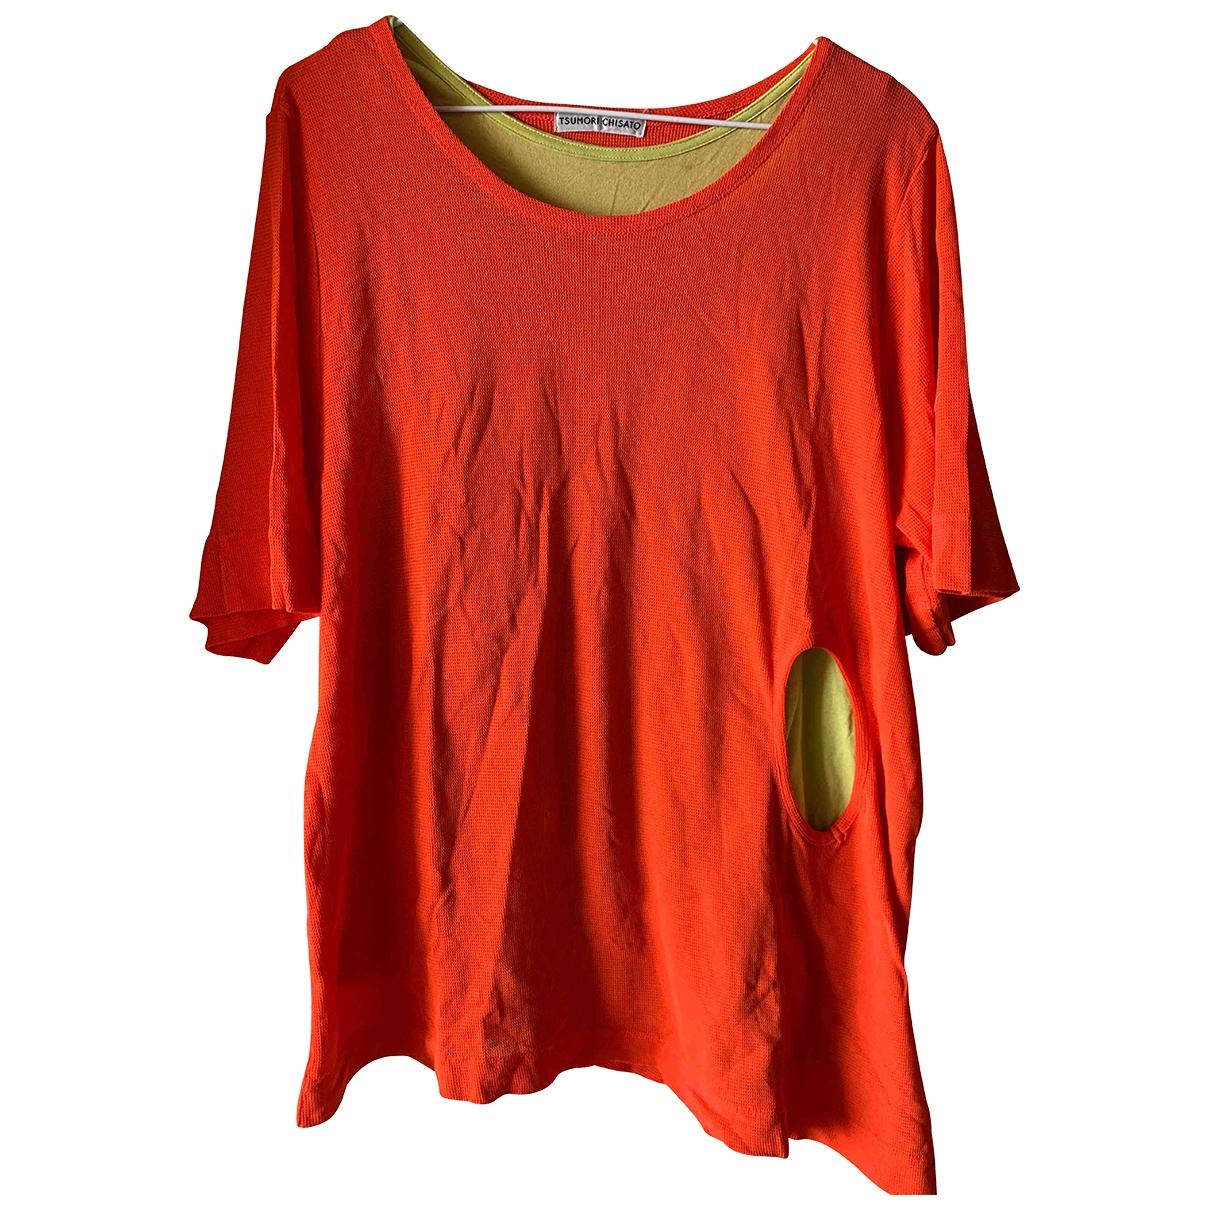 Tsumori Chisato - Top   pour femme en coton - orange